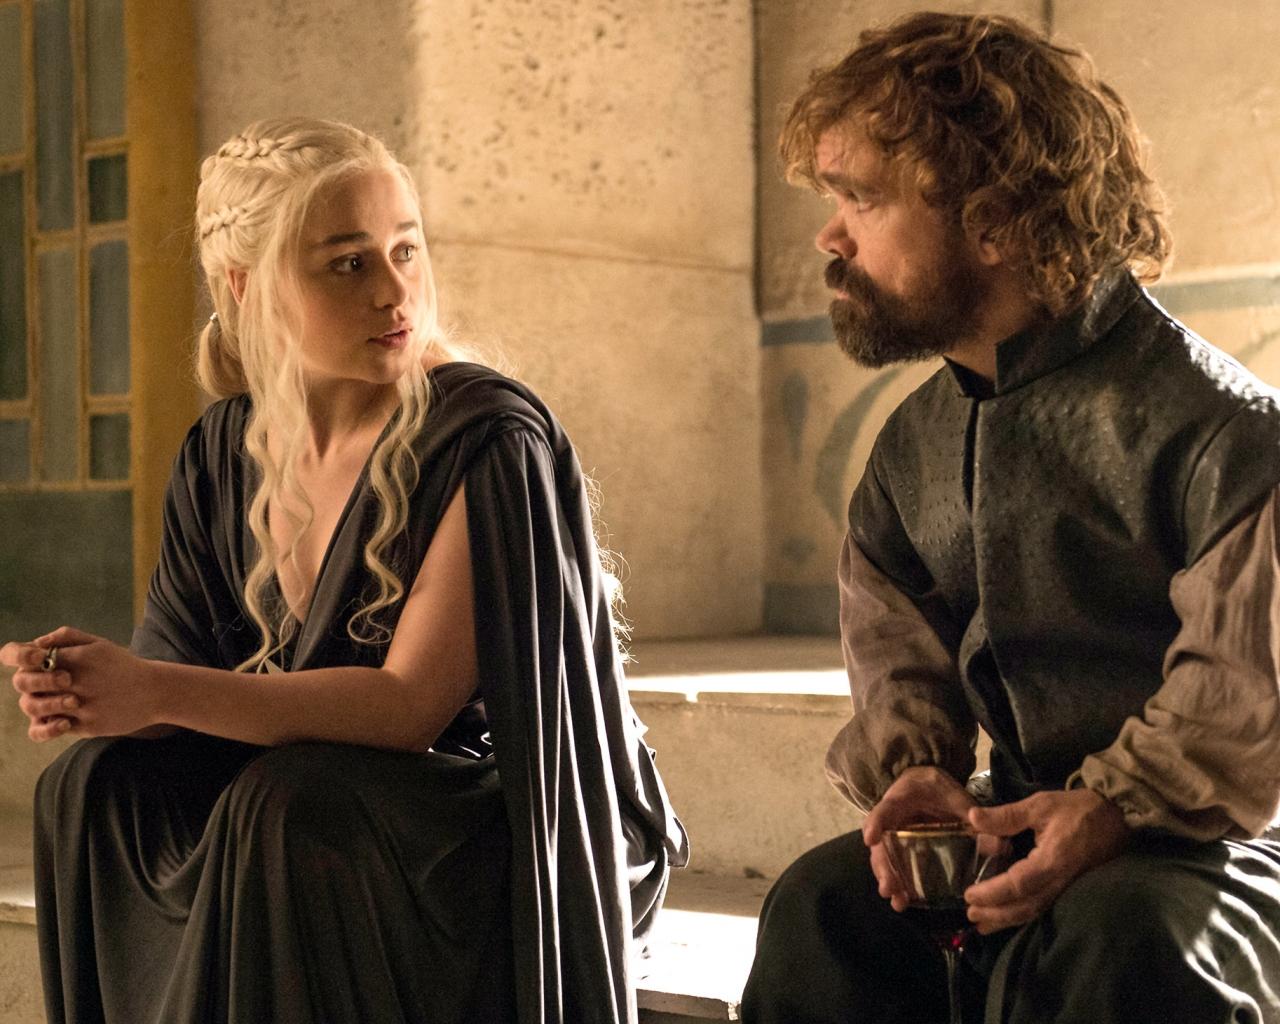 Daenerys y el bastardo - 1280x1024